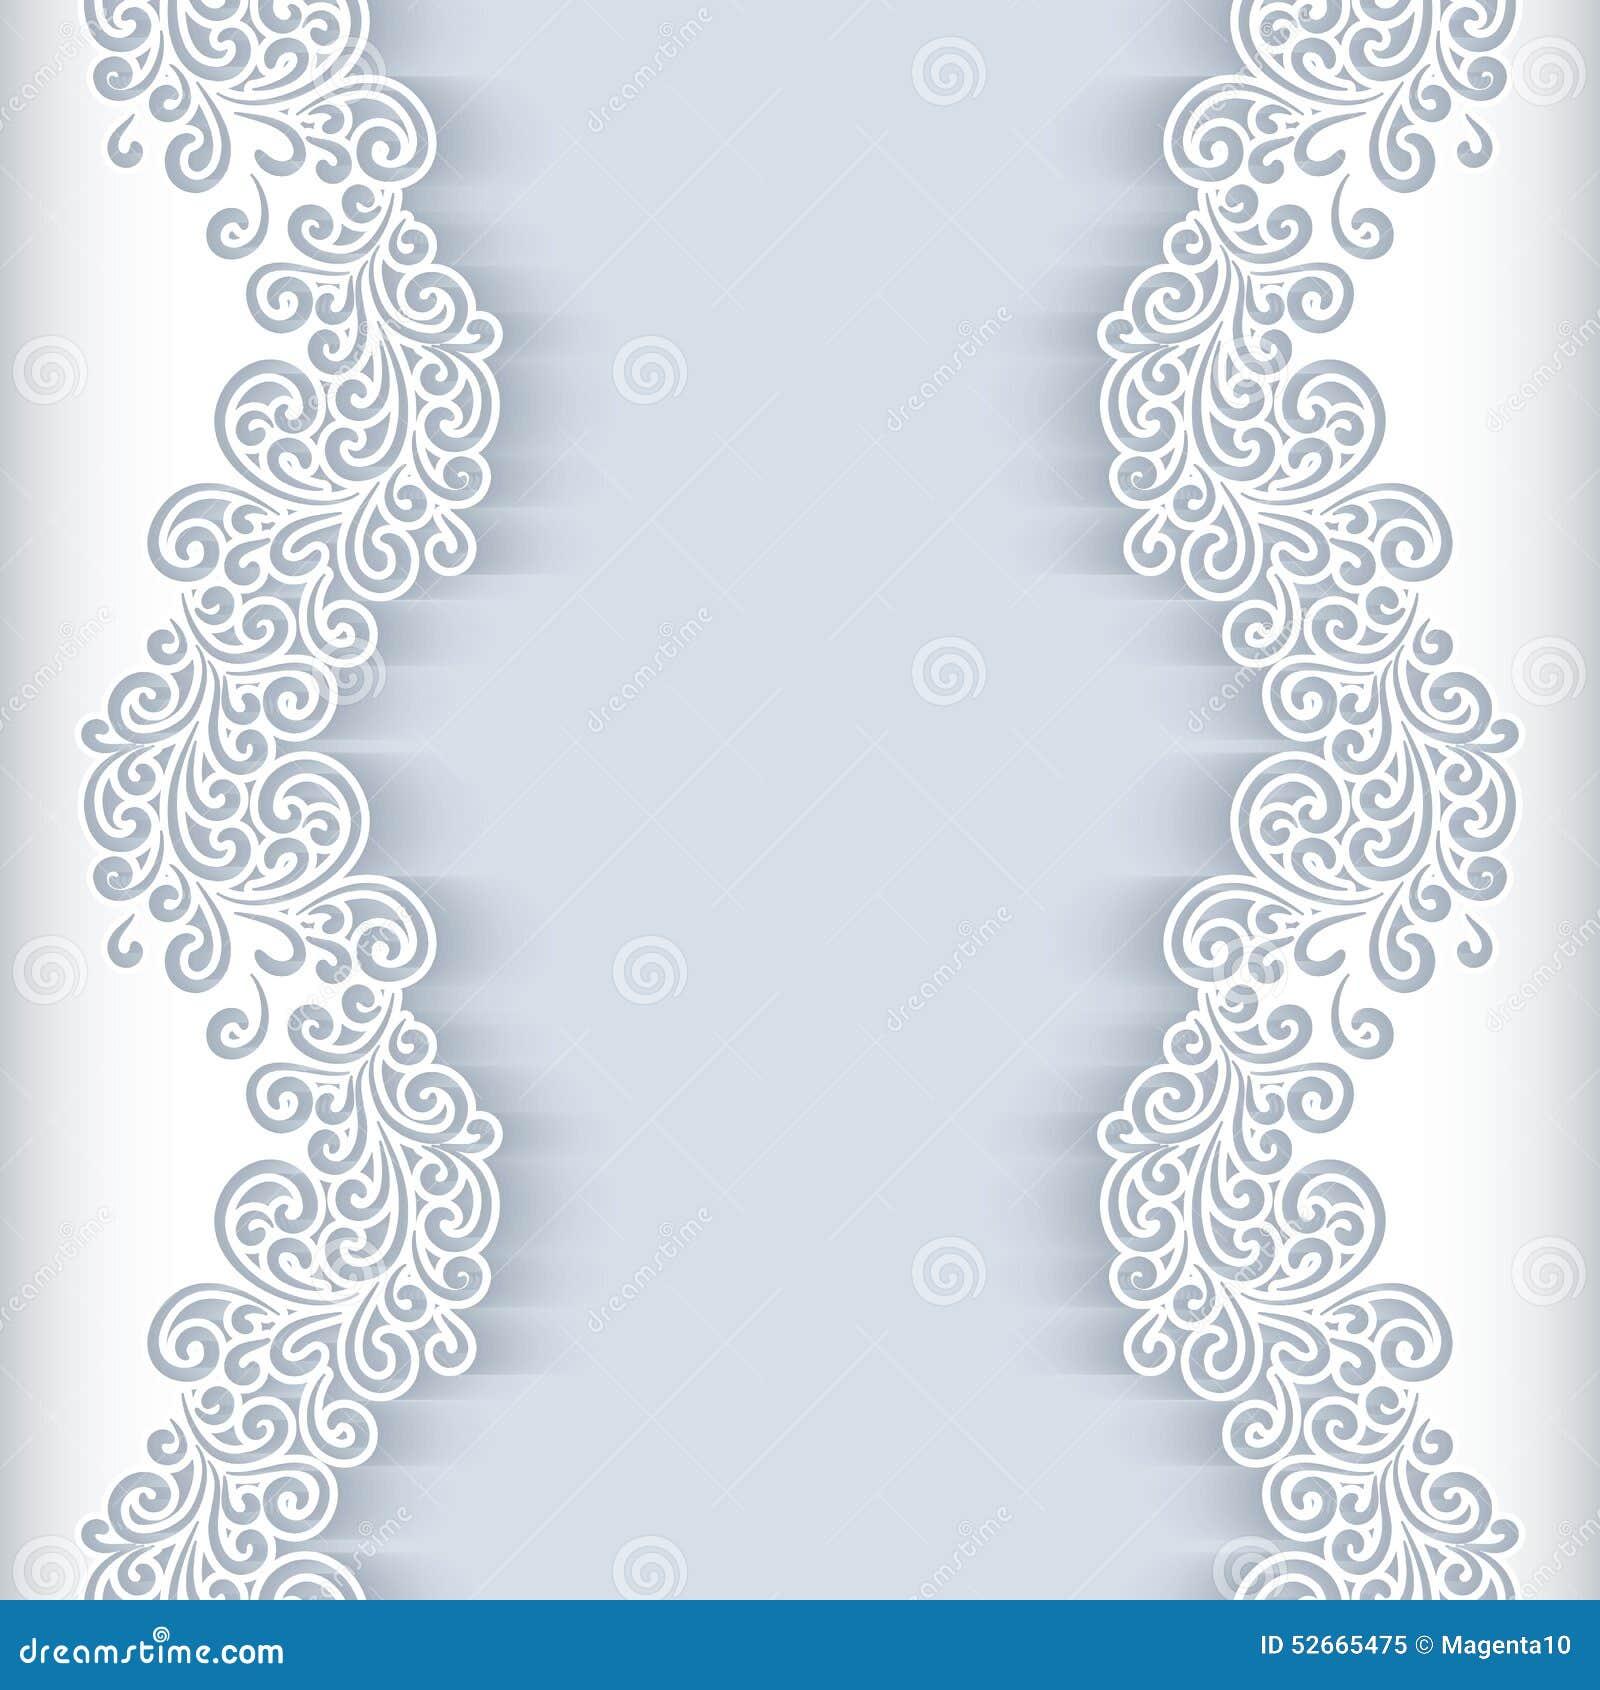 Wedding Paper: White Paper Background Stock Vector. Illustration Of Decor